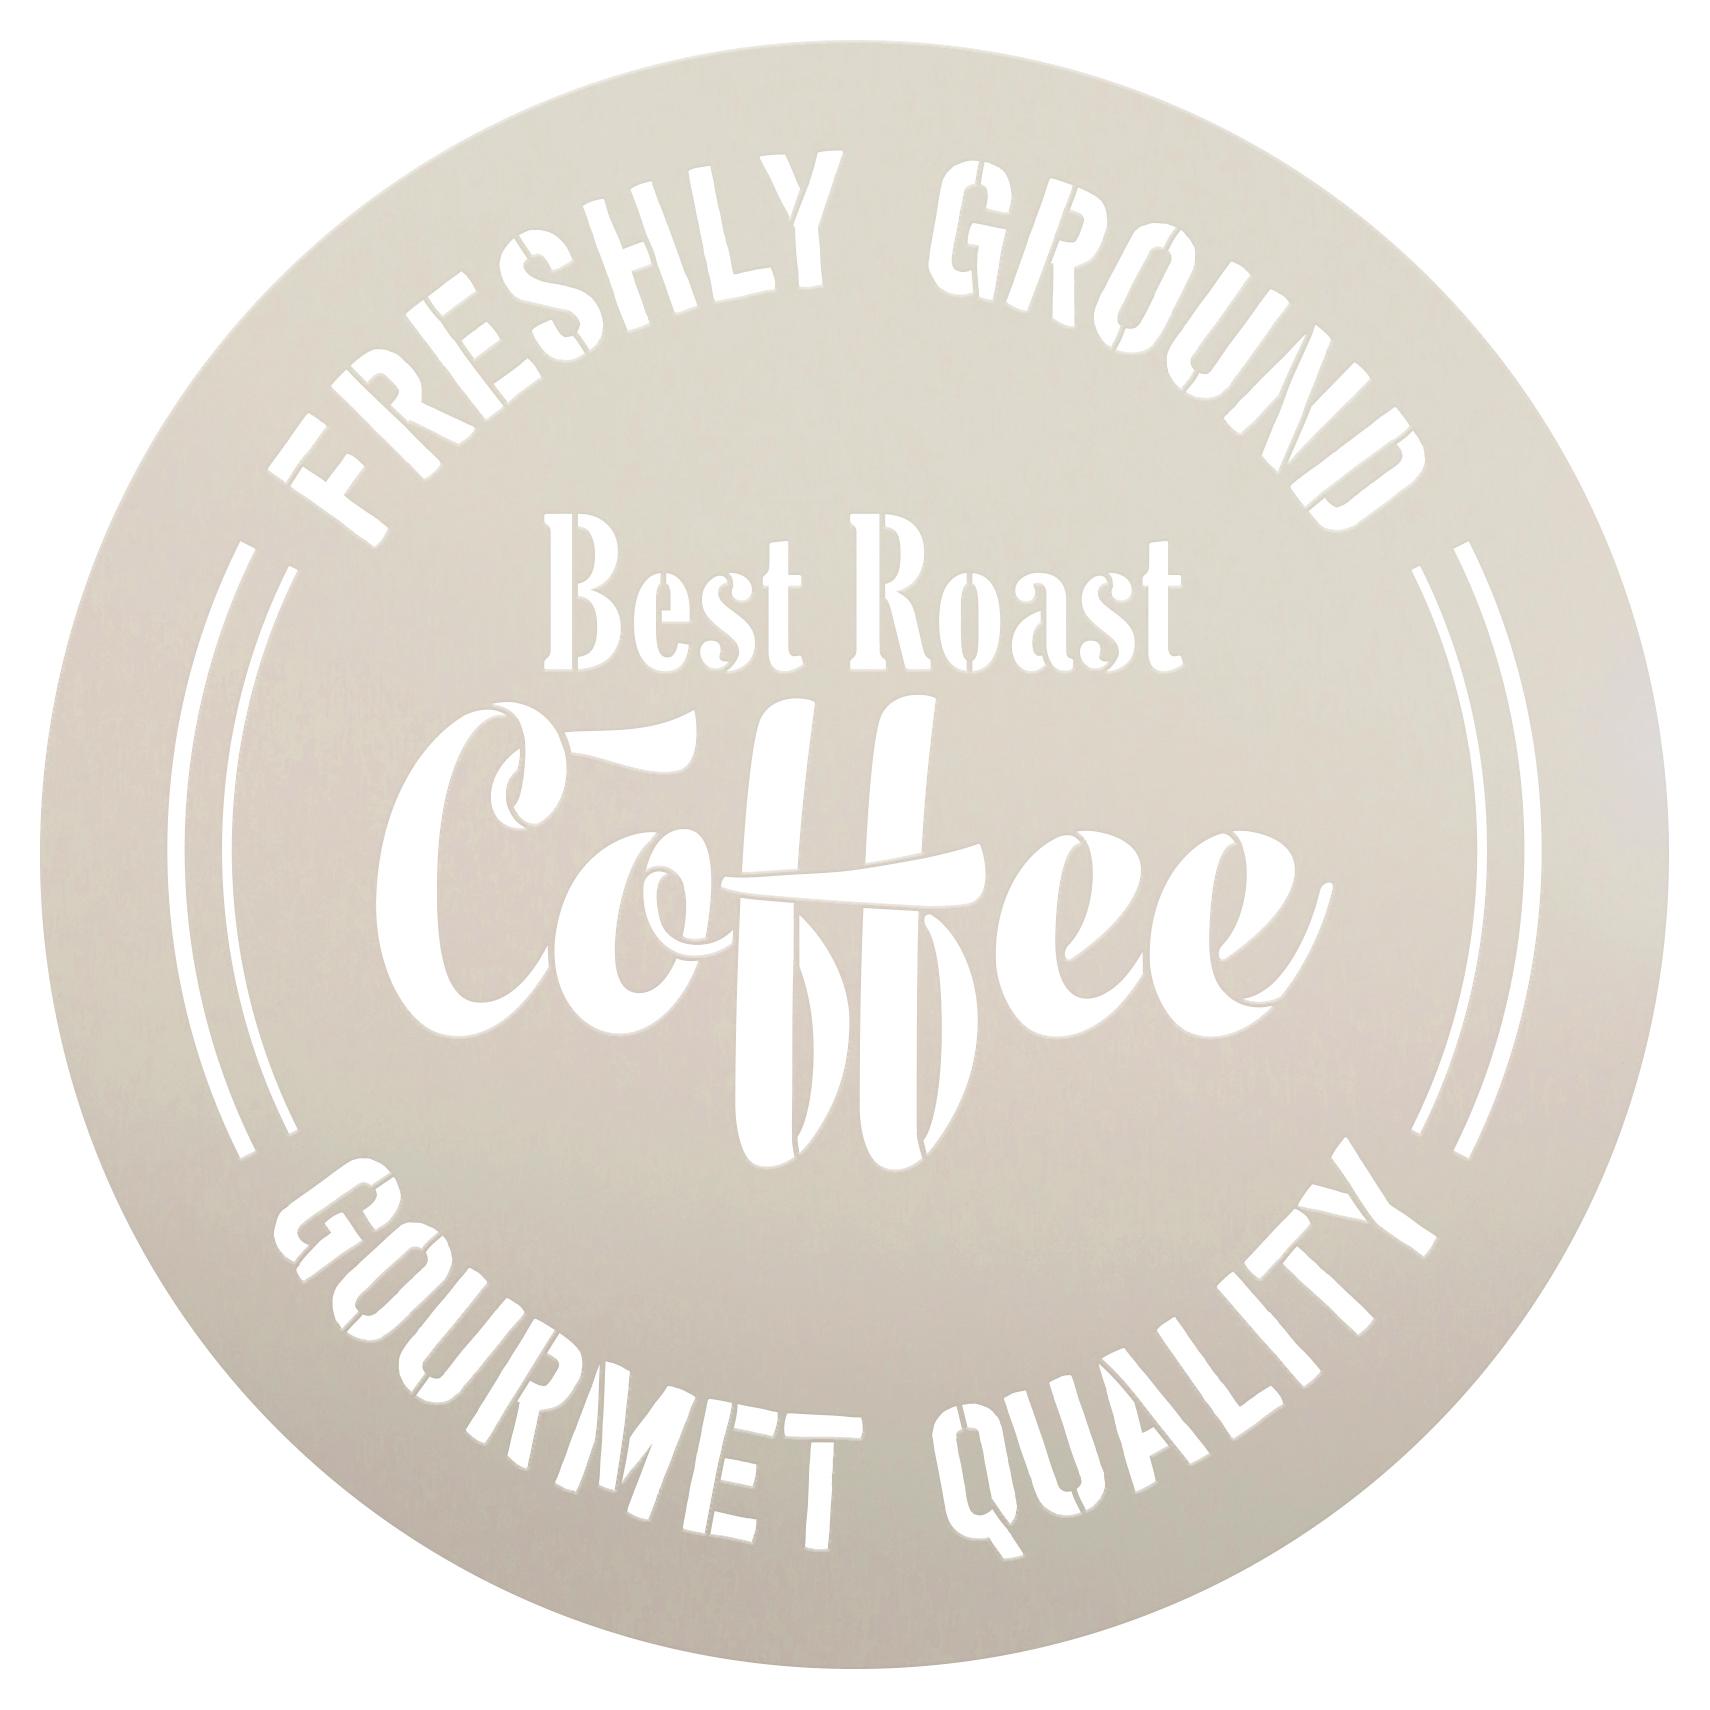 "Best Roast Coffee | Freshly Ground | Gourmet Quality Stencil by StudioR12 | Coffee Art  | Reusable Mylar Template | 12"" Round | Medium"